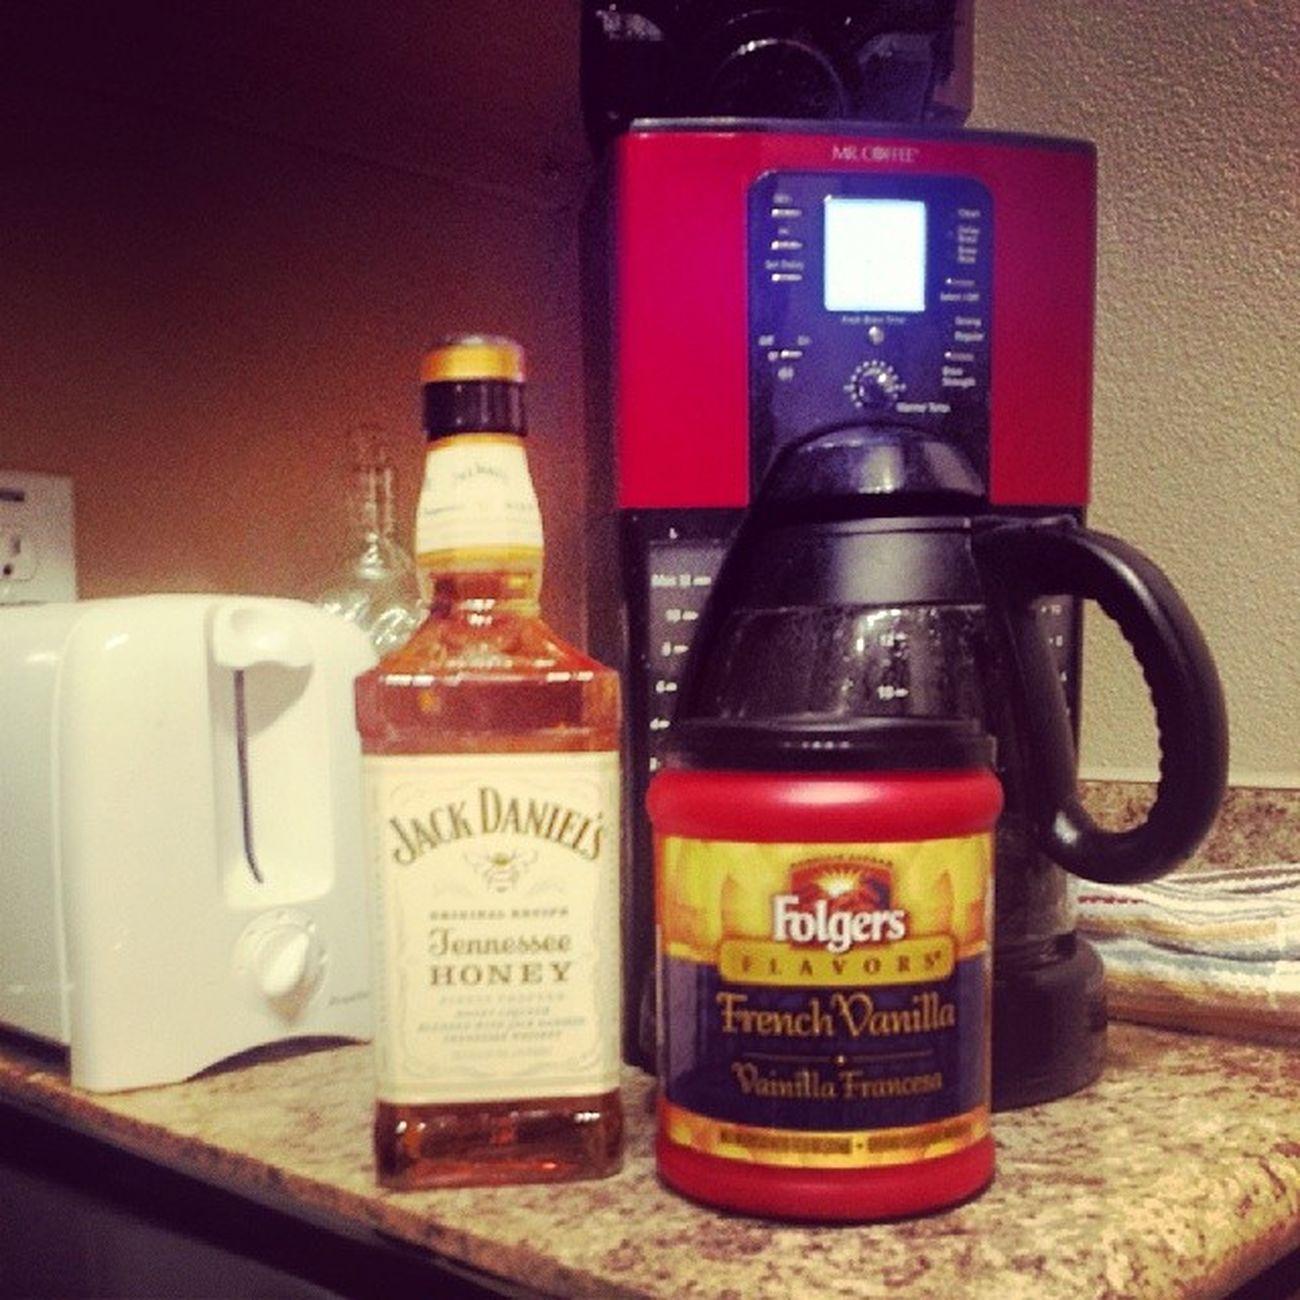 DrunkAndEnergized JackDanielsTennesseeHoney and FolgersFrenchVanilla Donotdisturb ImChillin